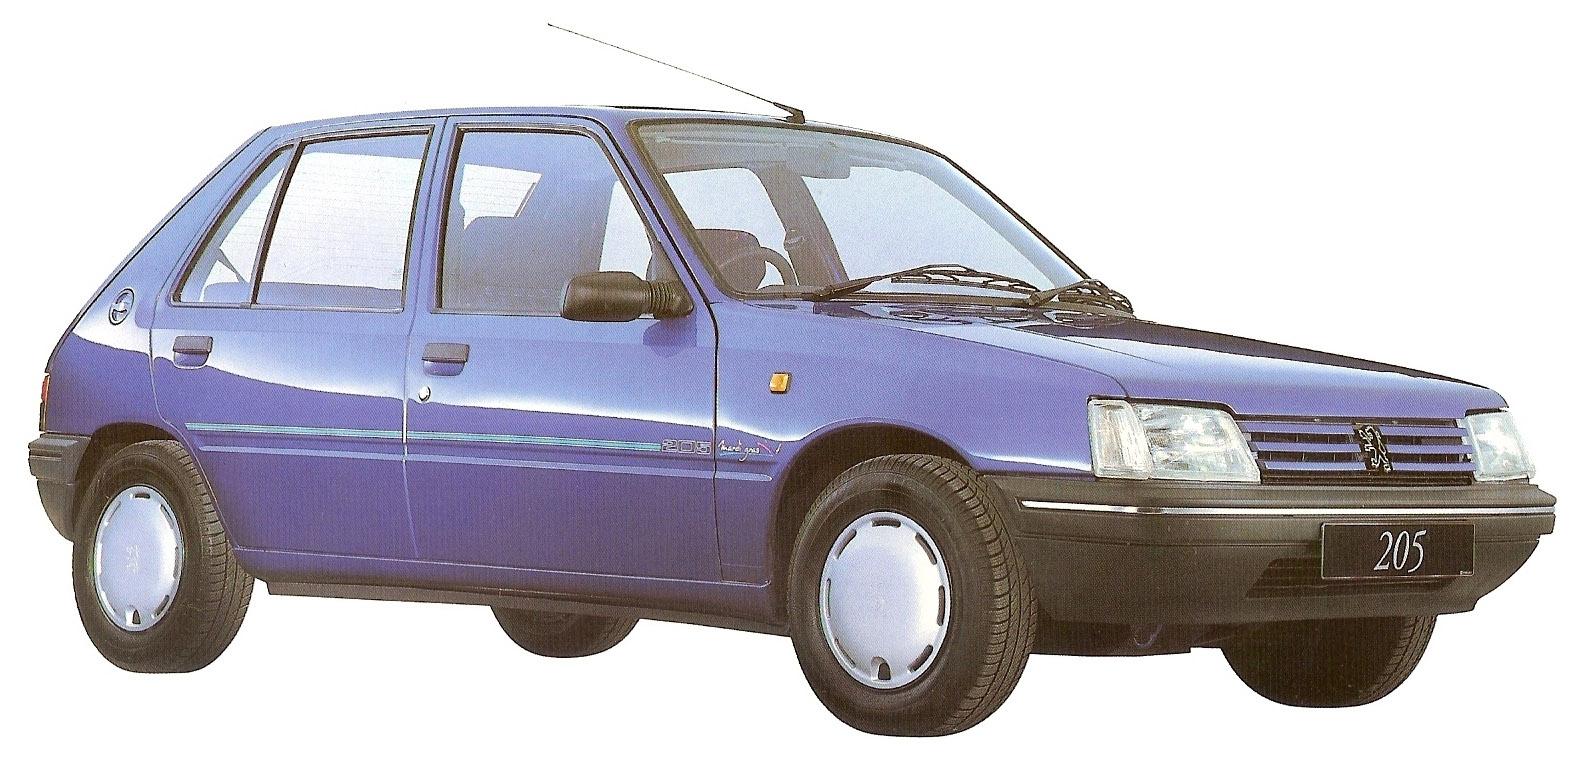 1995 Peugeot 205 Mardi Gras